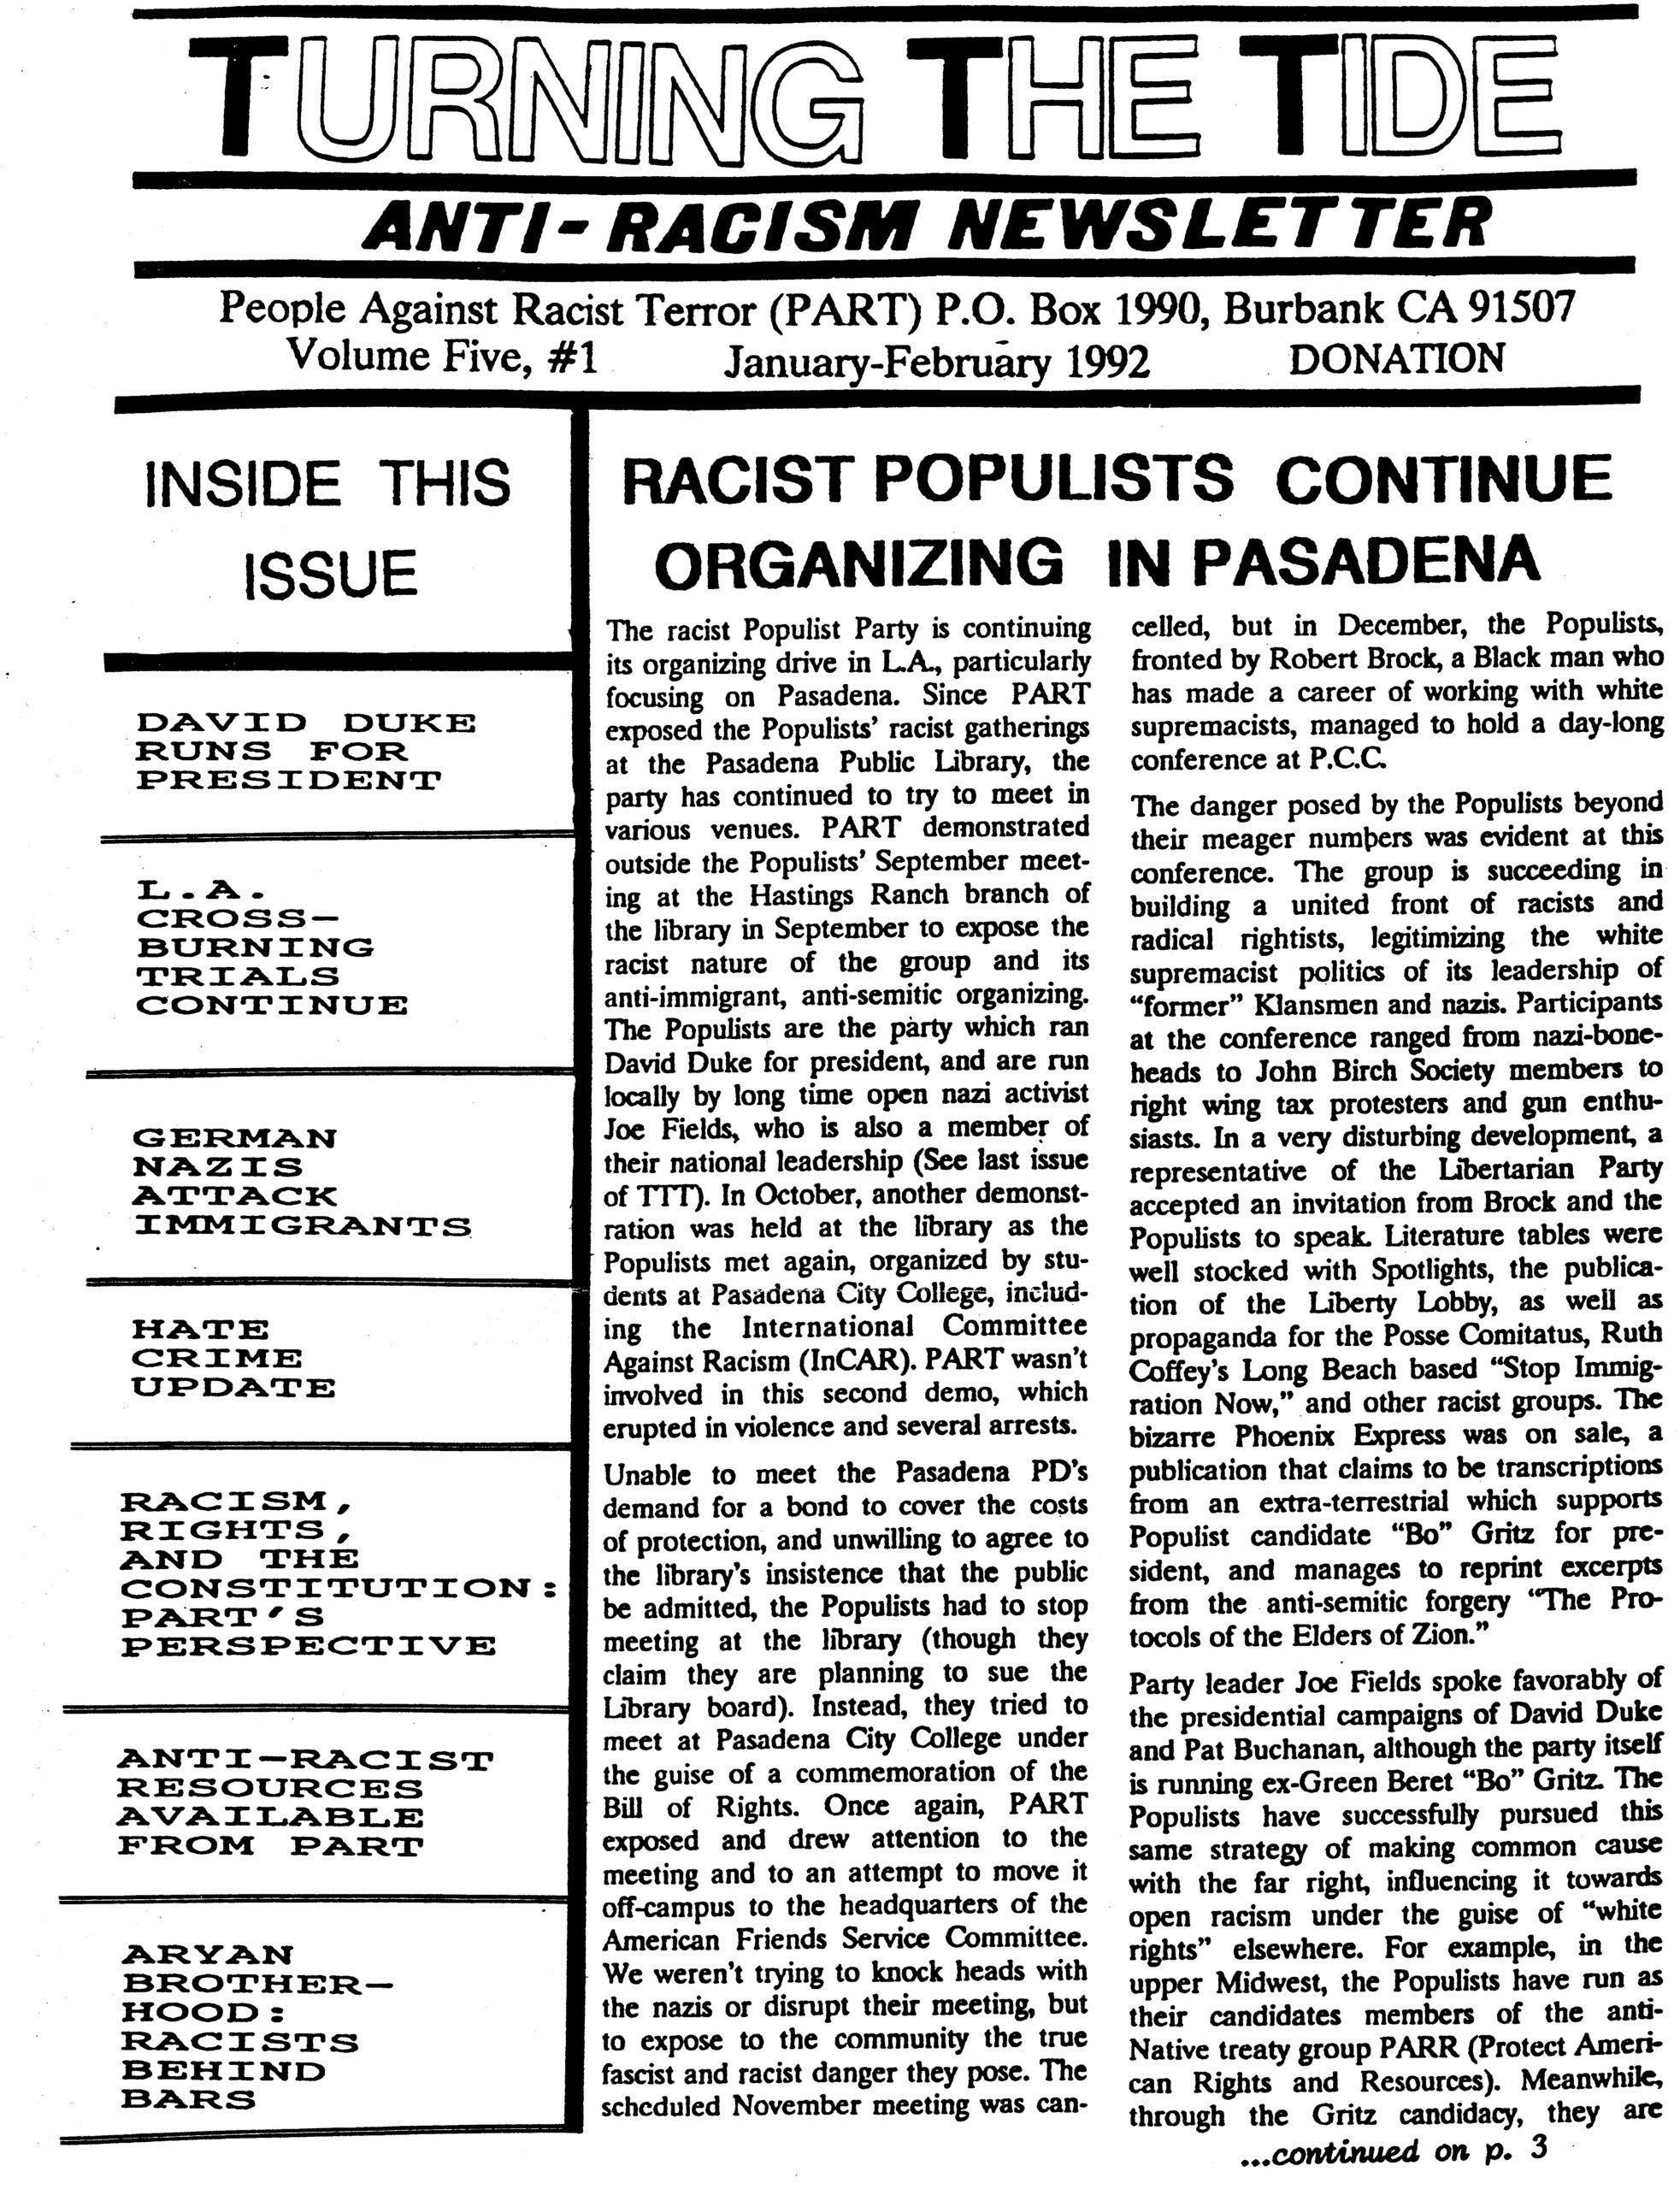 TTT Vol. 5 #1, Jan-Feb. 1992